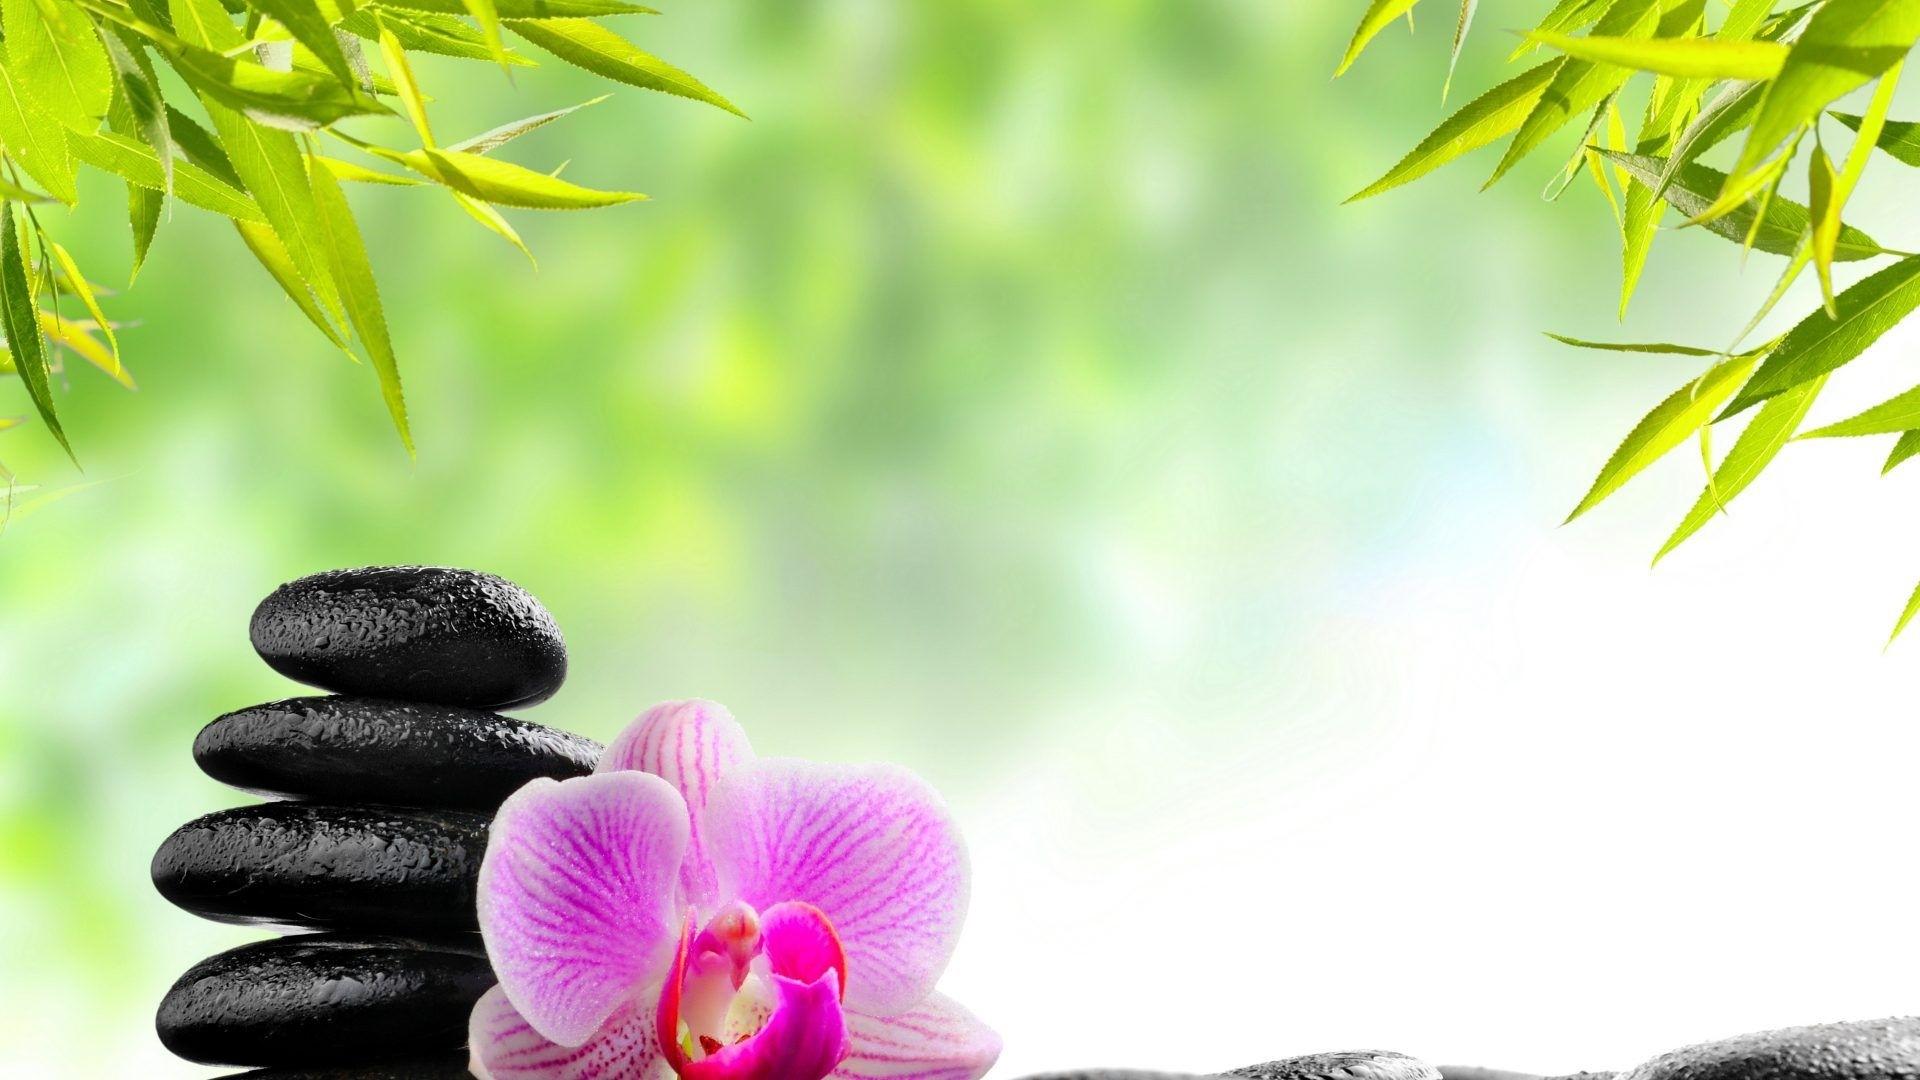 Zen Free Wallpaper